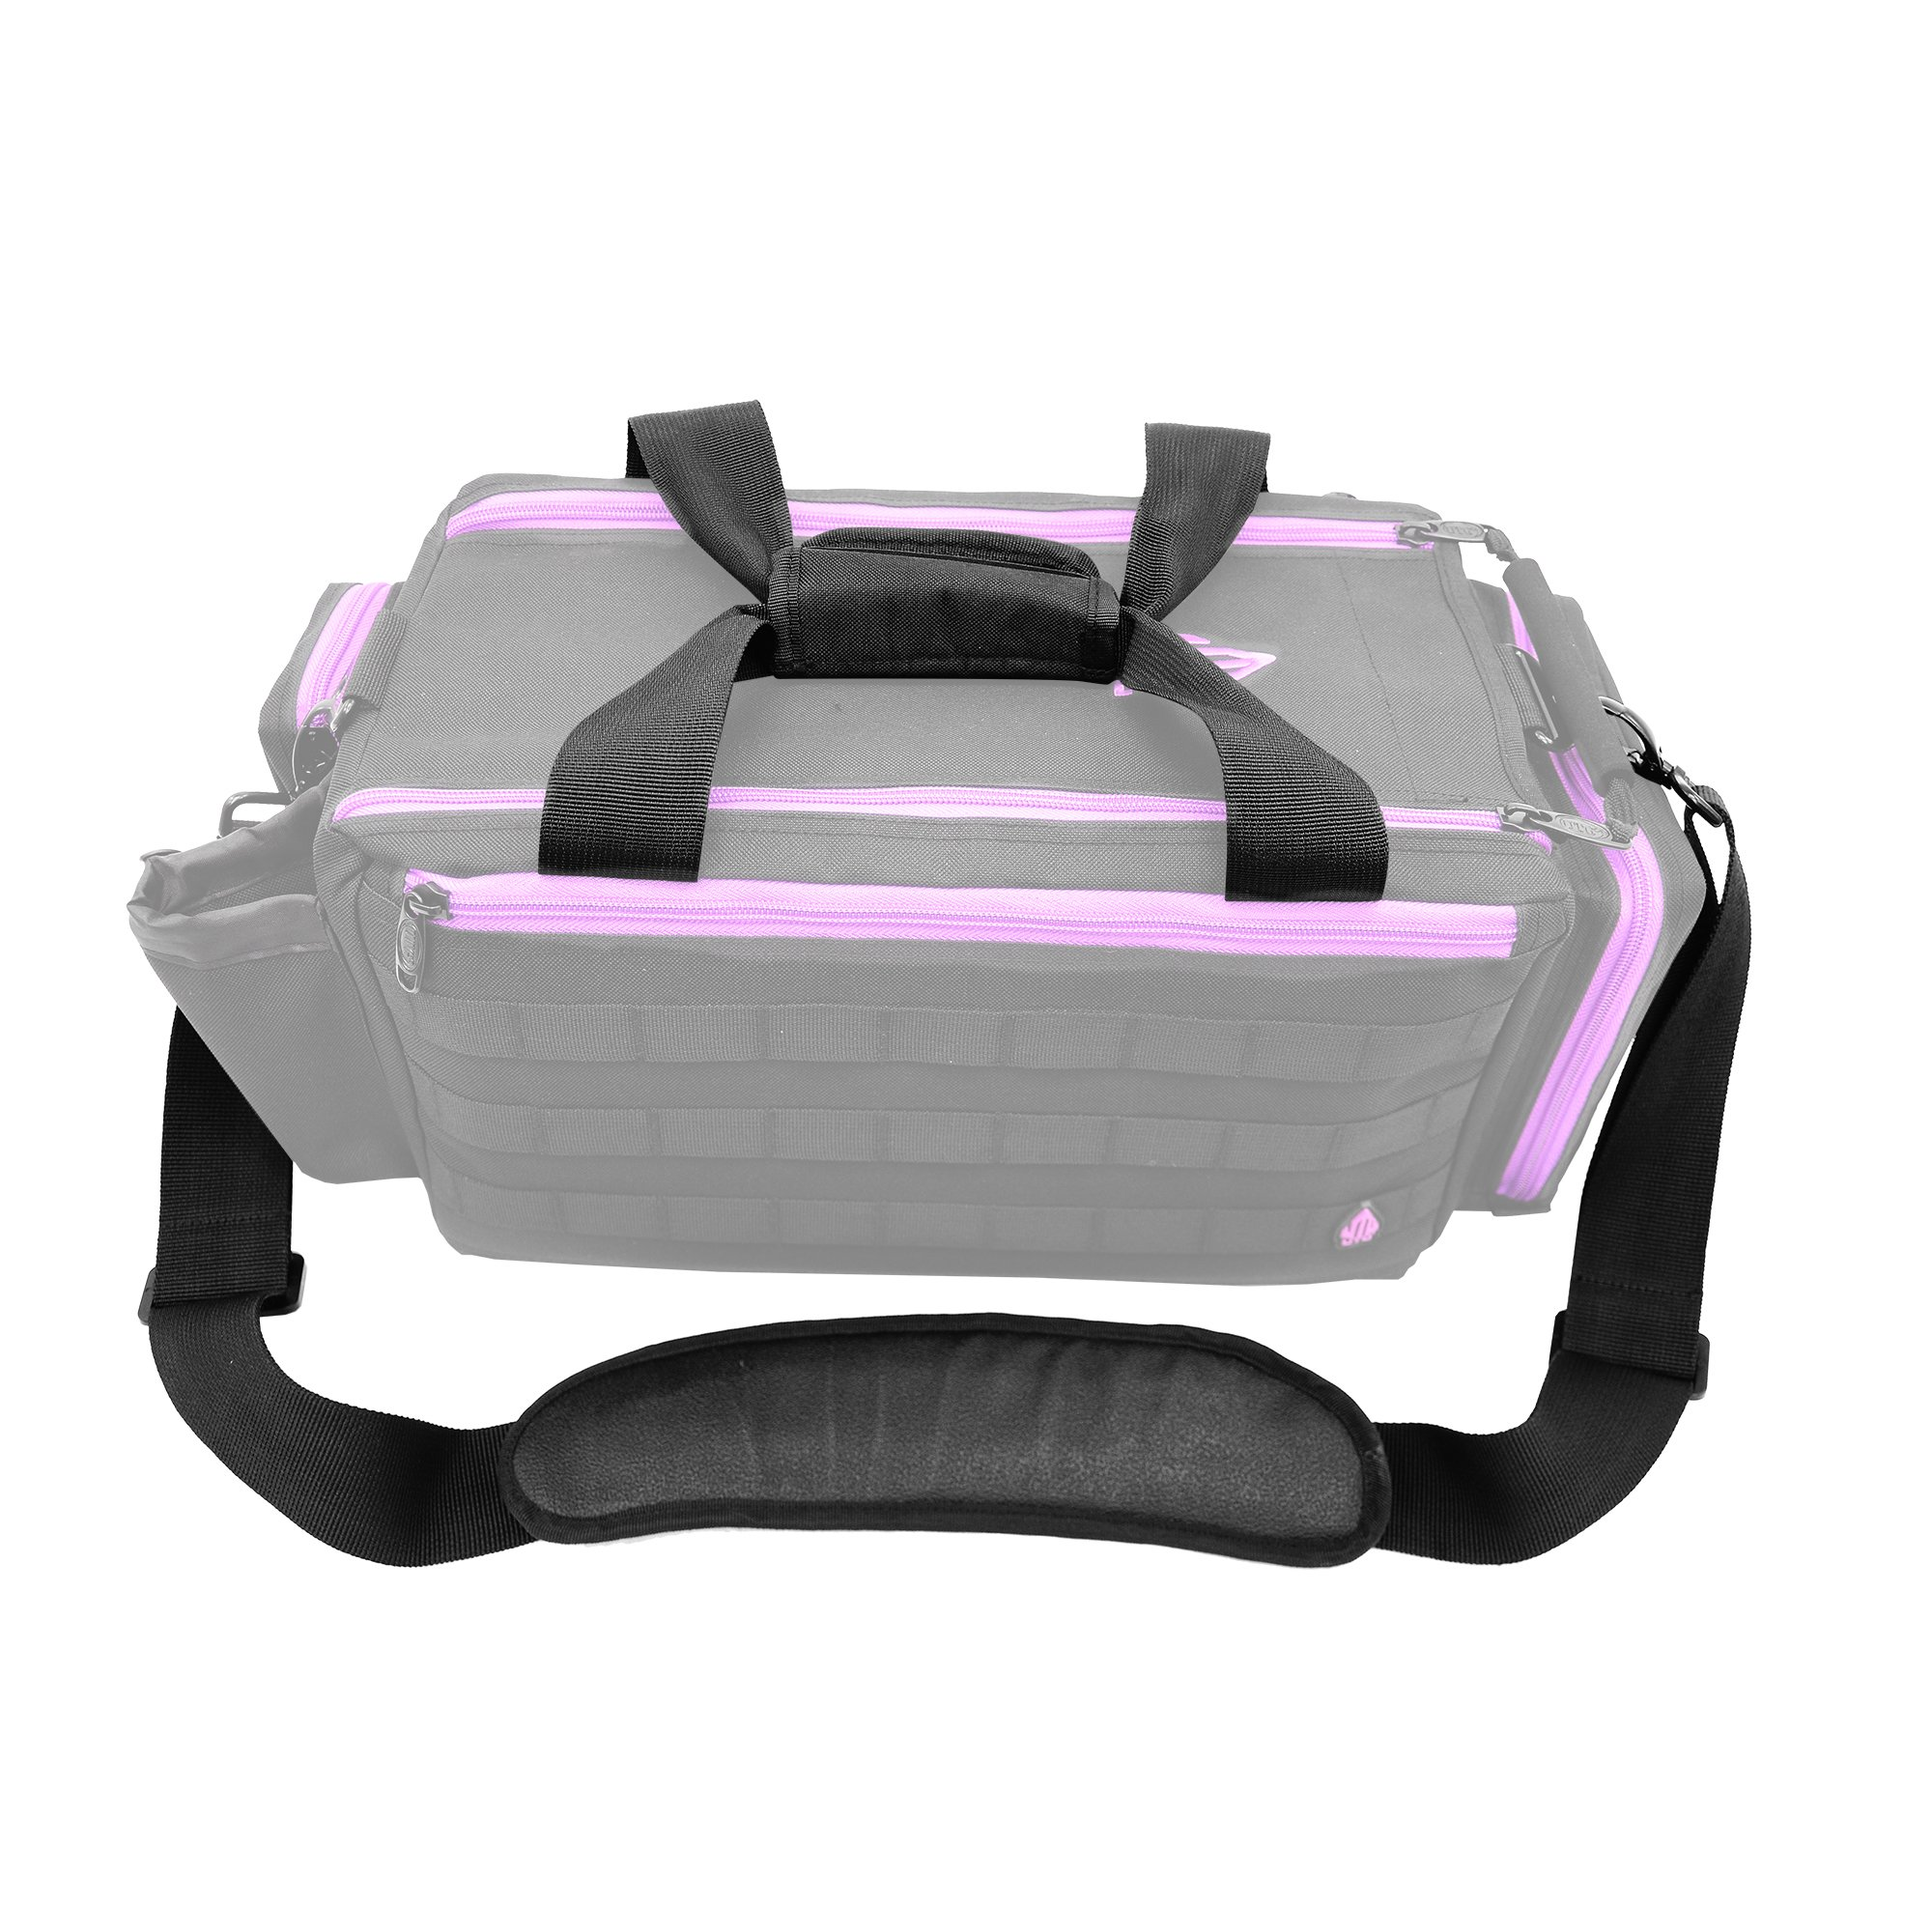 UTG All in One Range/Utility Go Bag, Black/Violet, 21'' x 10'' x 9'' by UTG (Image #12)